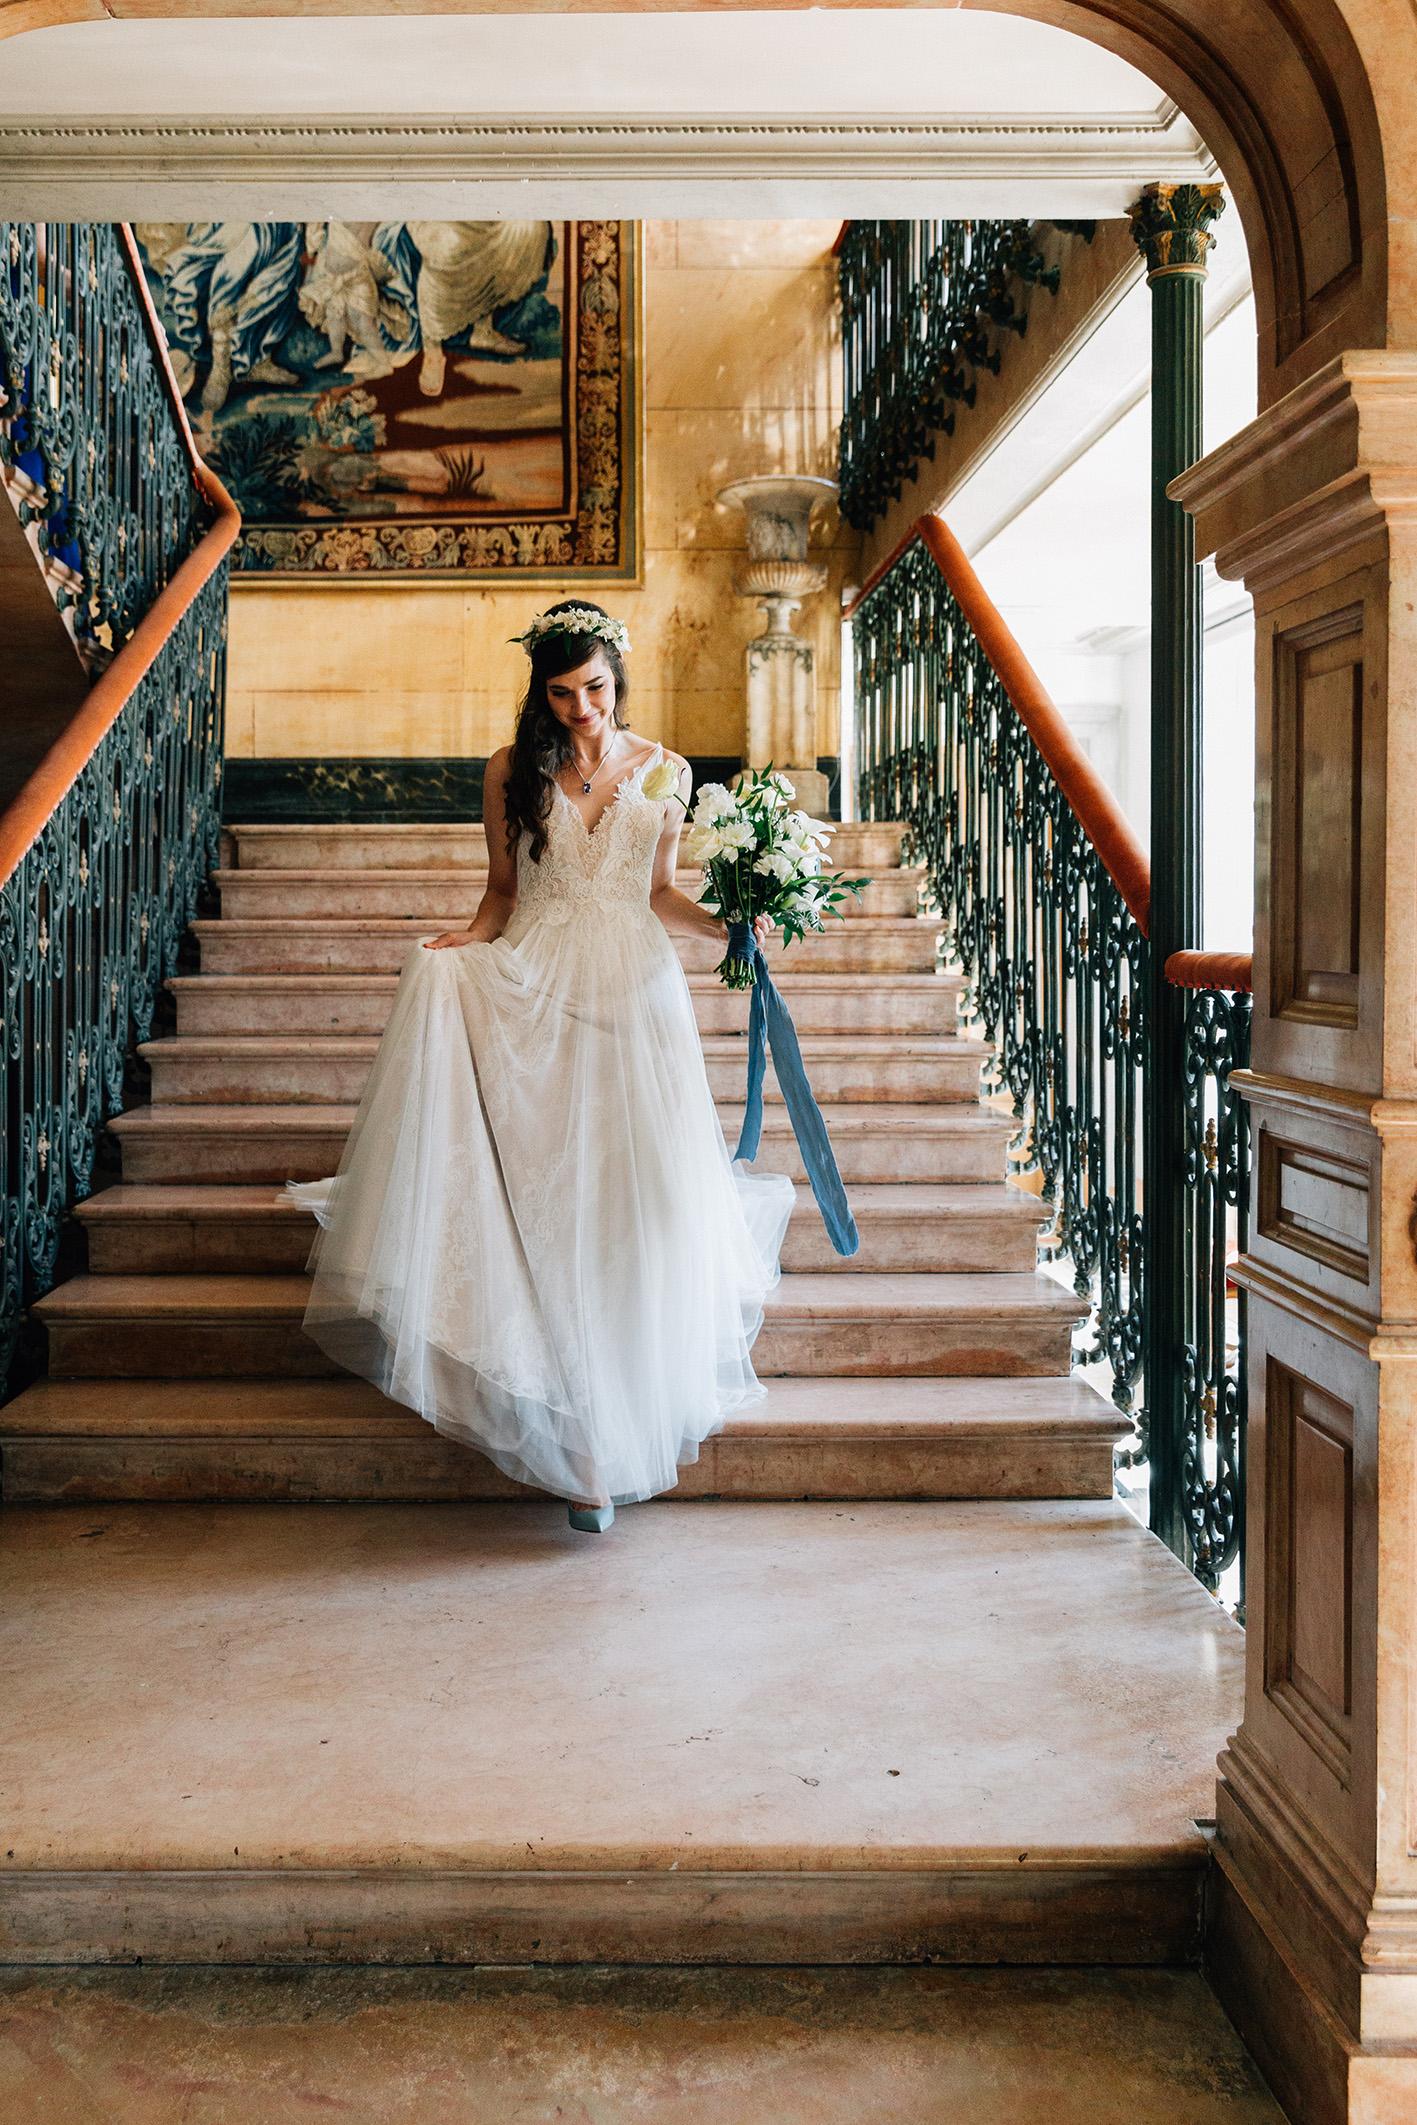 Chateau de Varennes, a very luxury Wedding in Burgundy